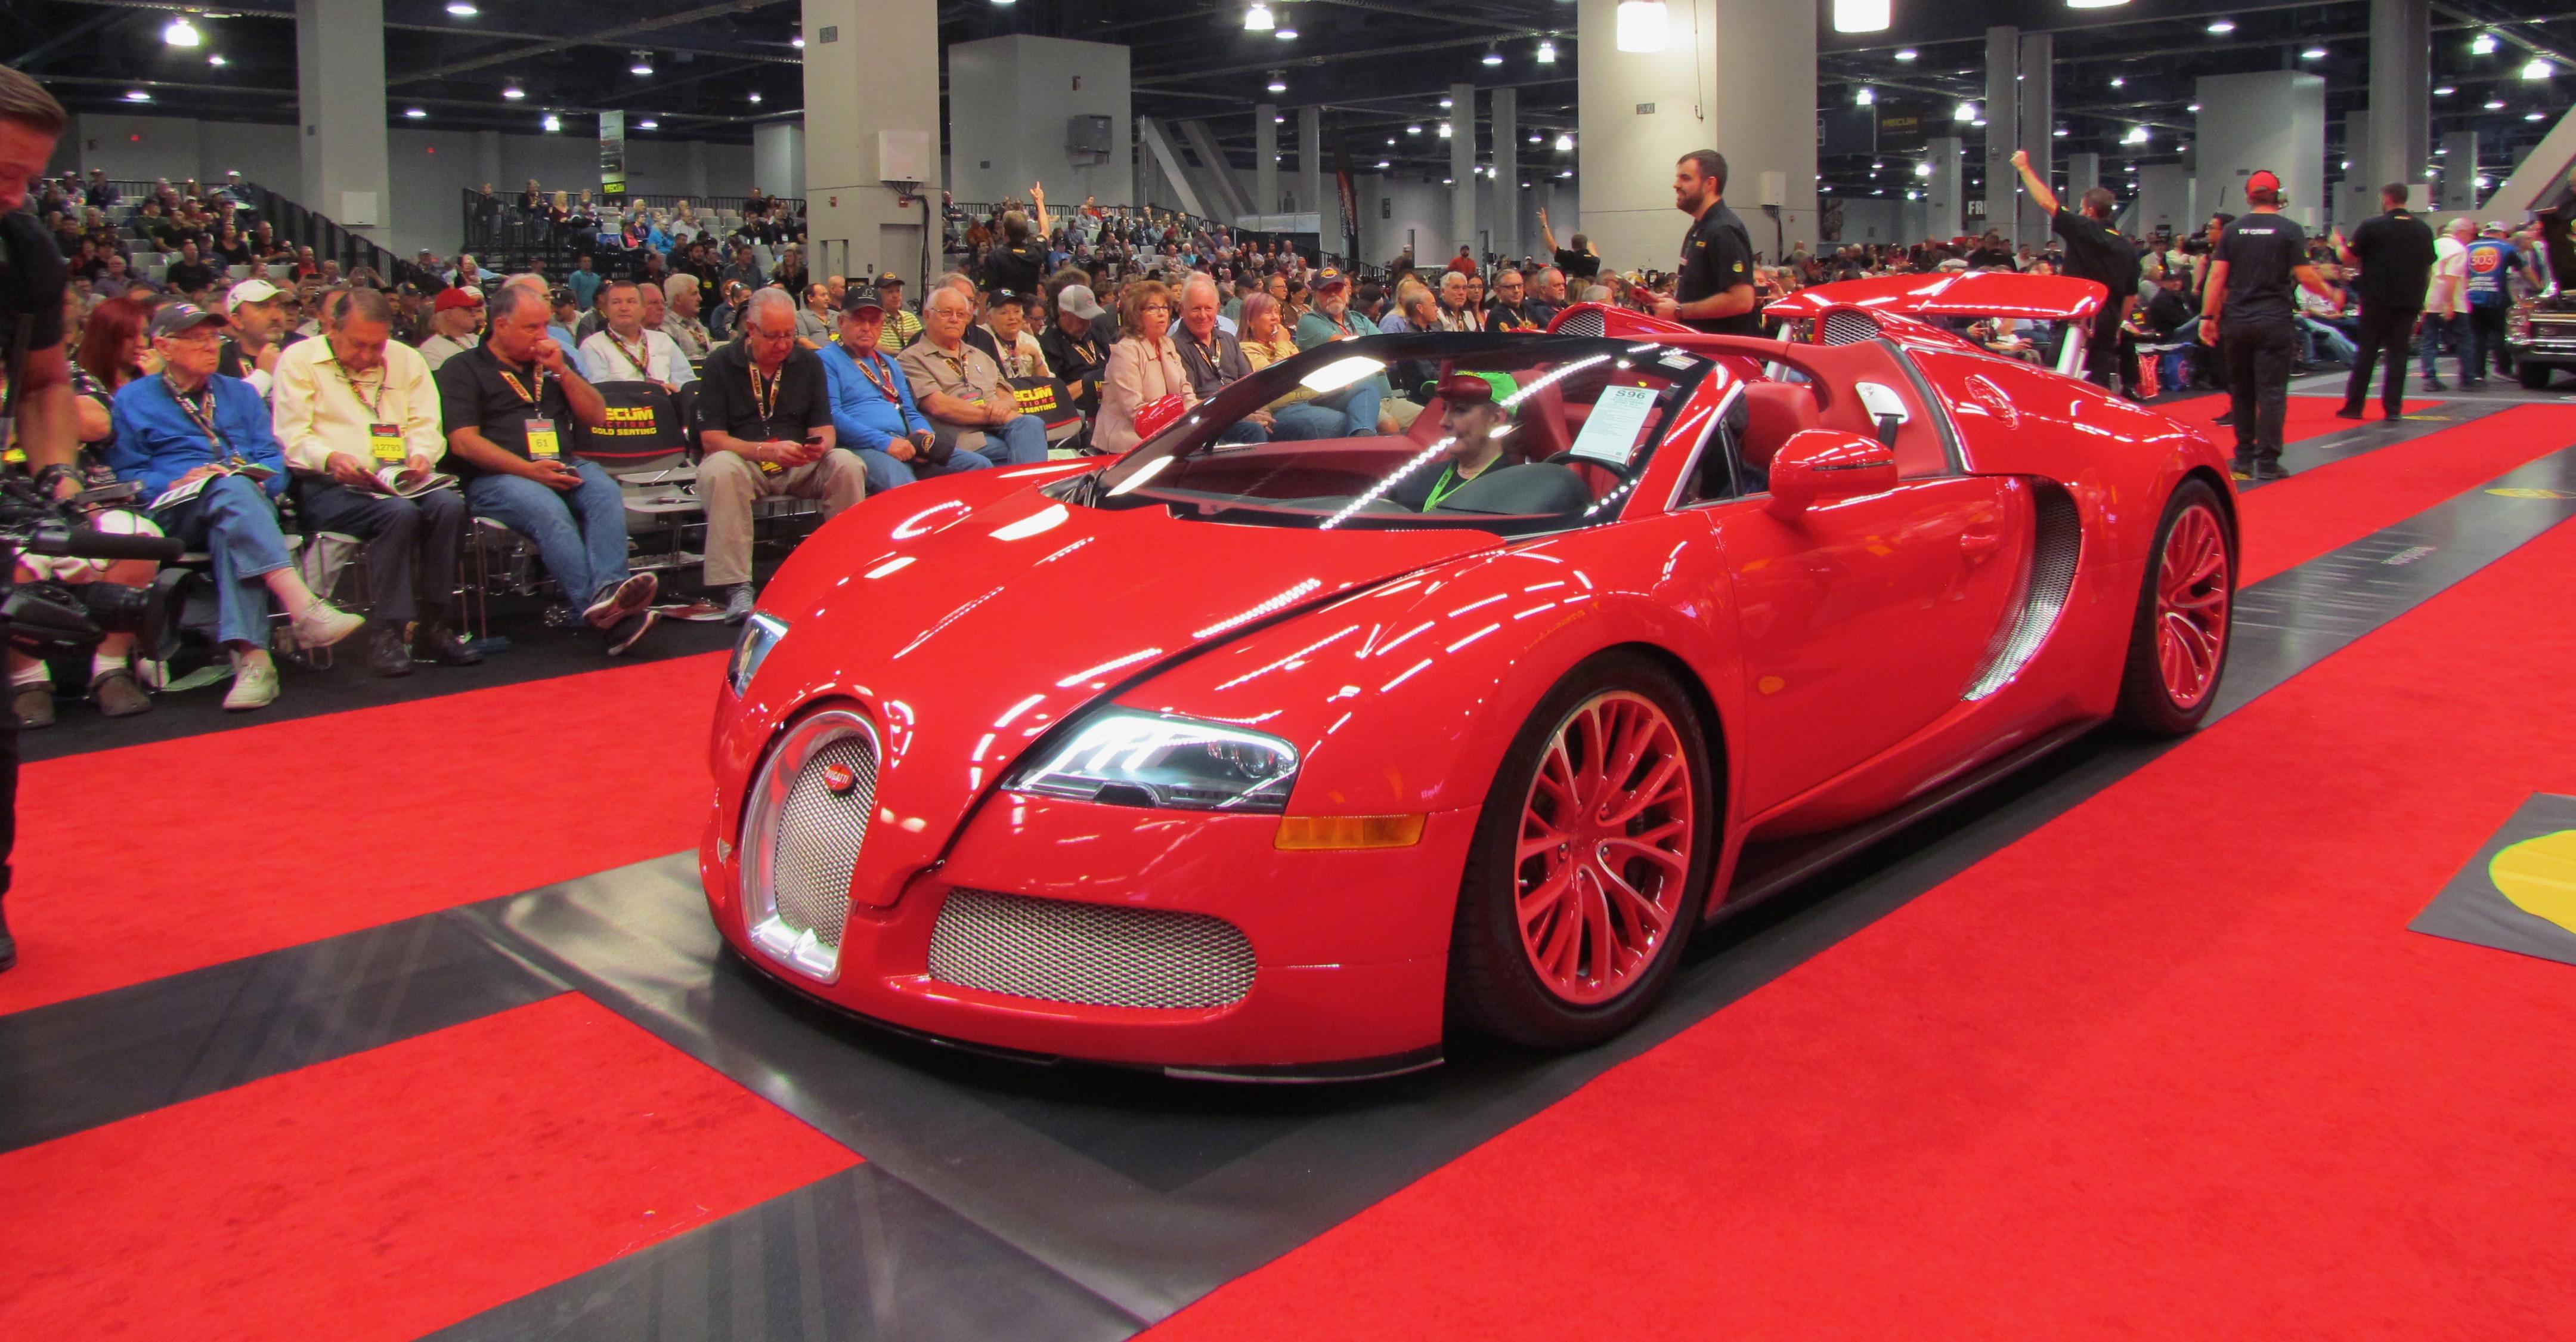 Las Vegas, Mecum hits $25.2 million jackpot in Las Vegas, ClassicCars.com Journal